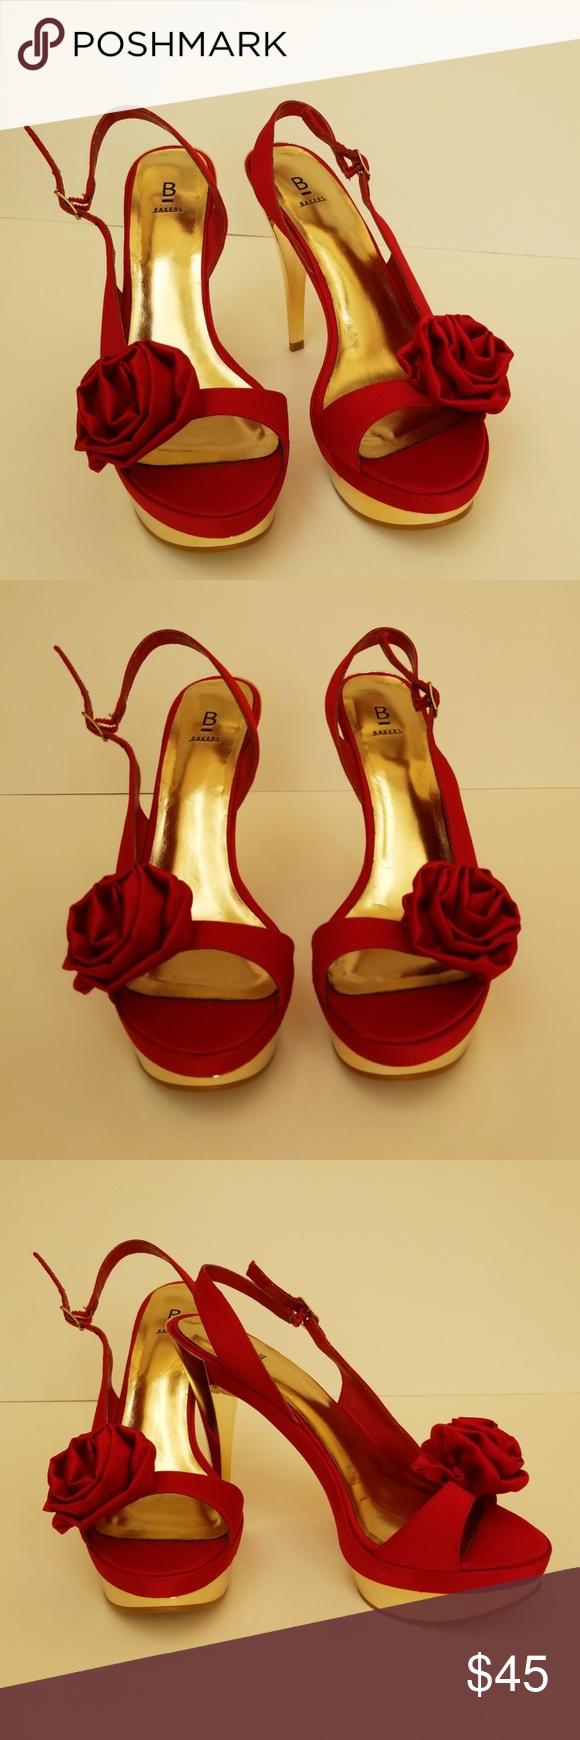 Bakers Platform Heels Size 8.5B Bakers Platform Heels. Size 8.5B, red and gold, …